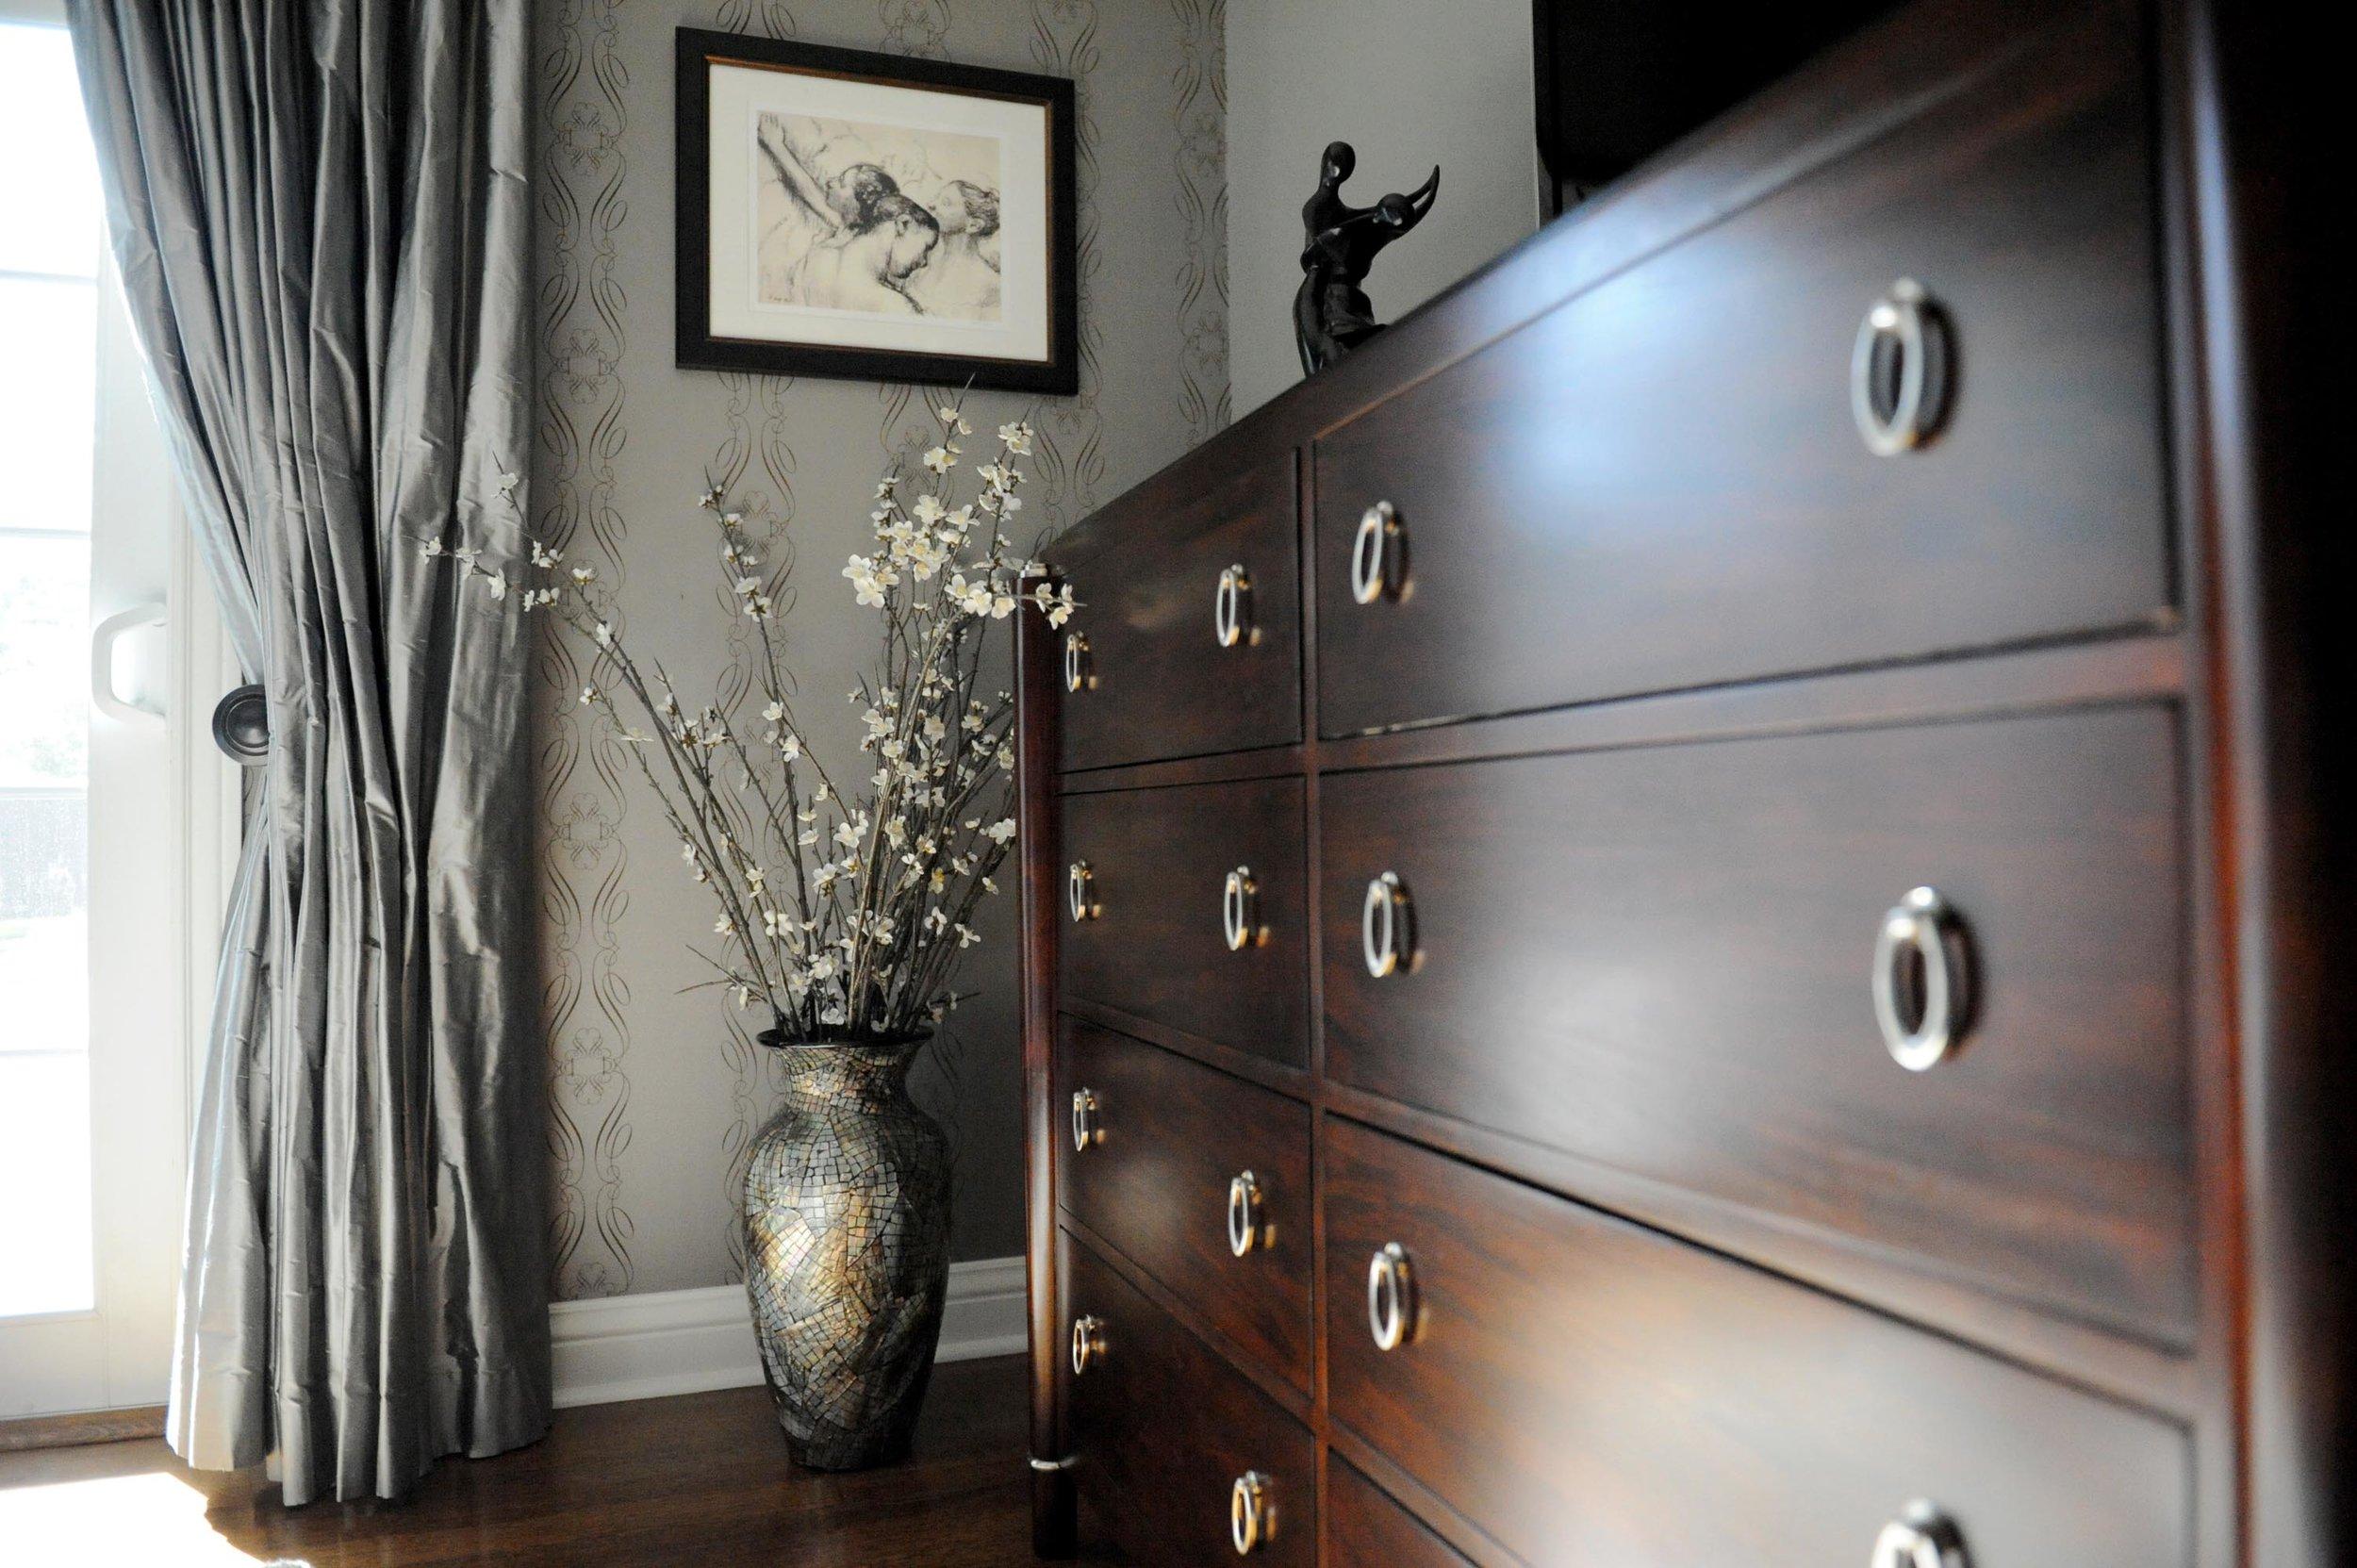 Stylish Cabinet and flower vase beside the window